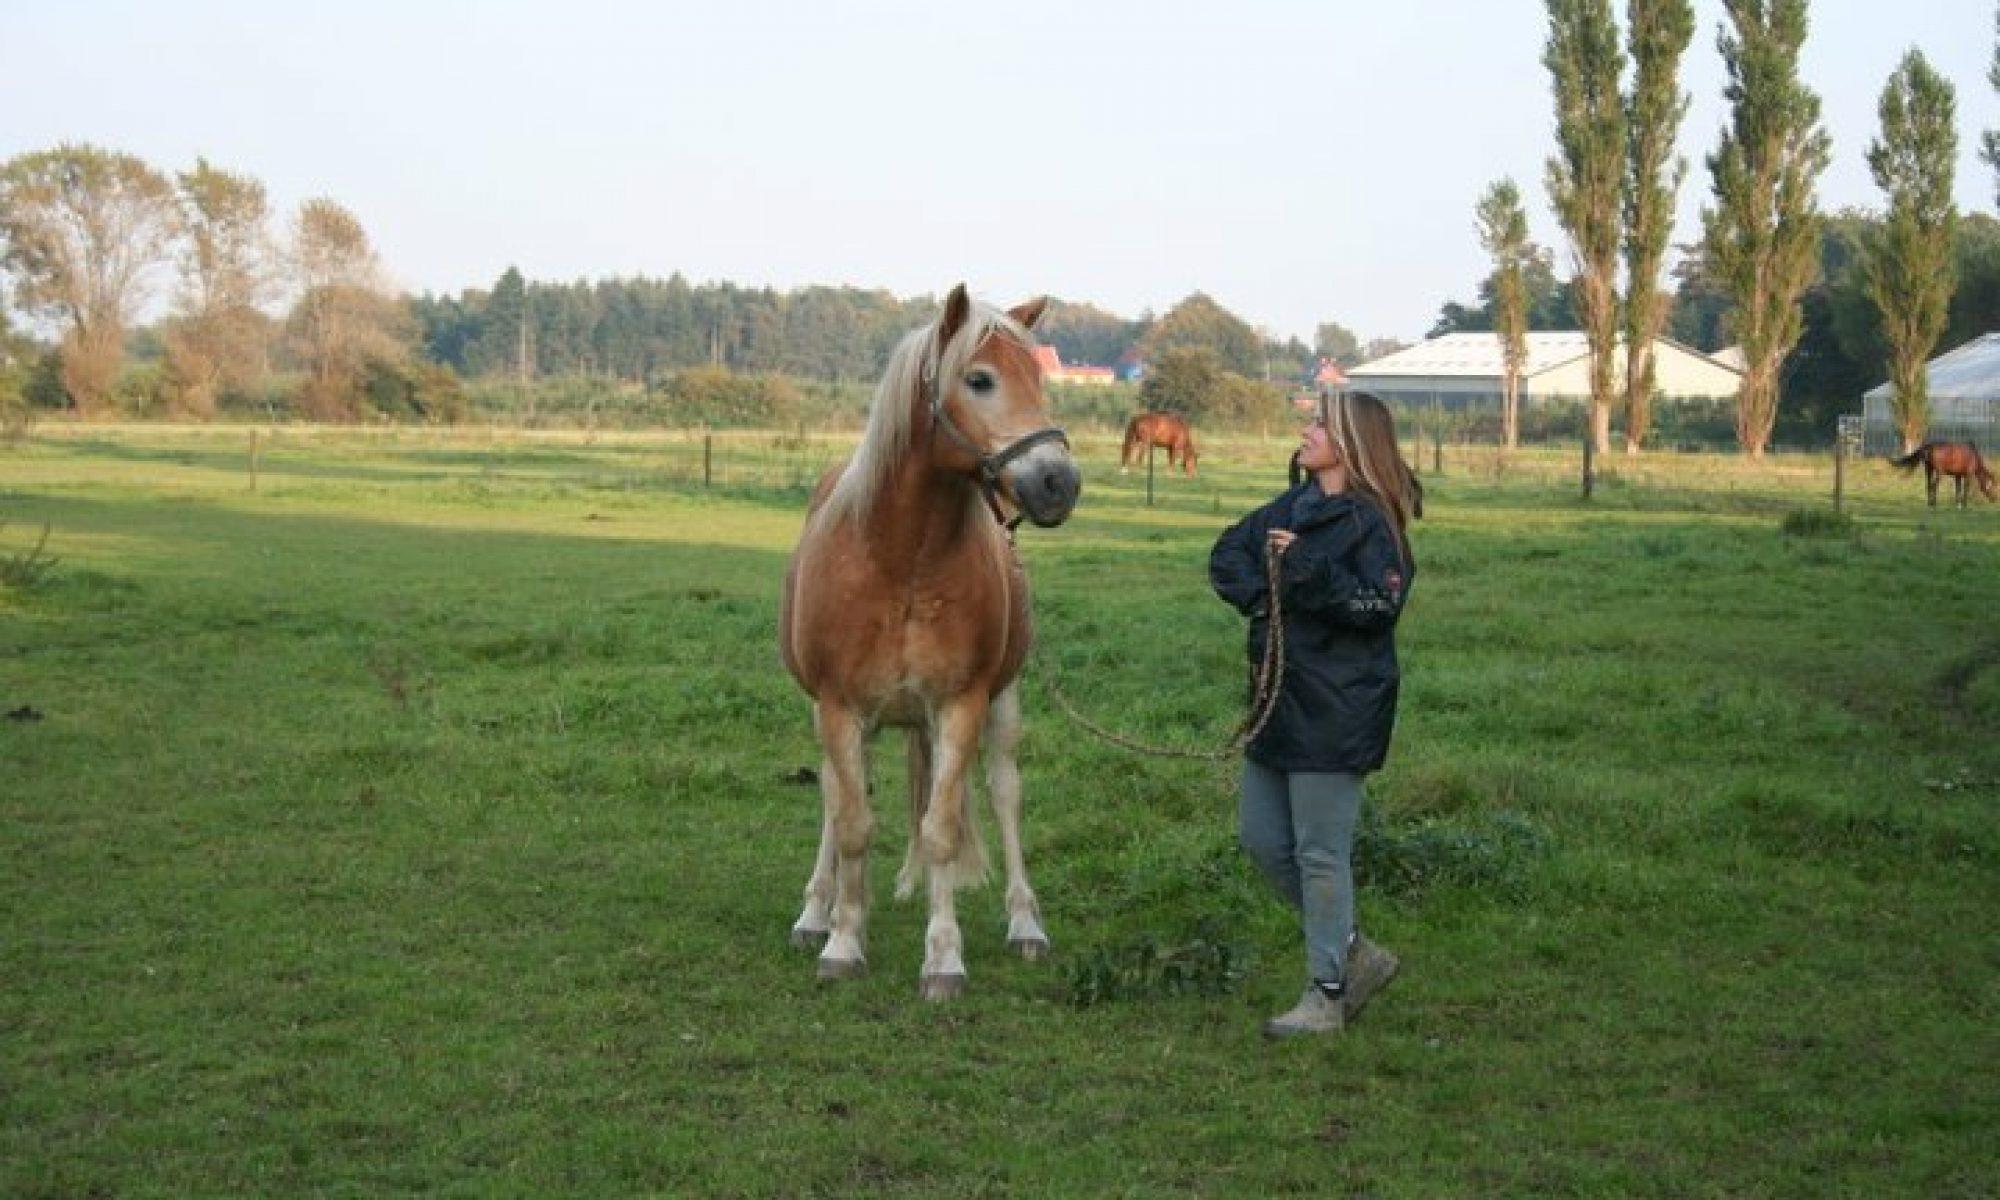 Hesteforstand